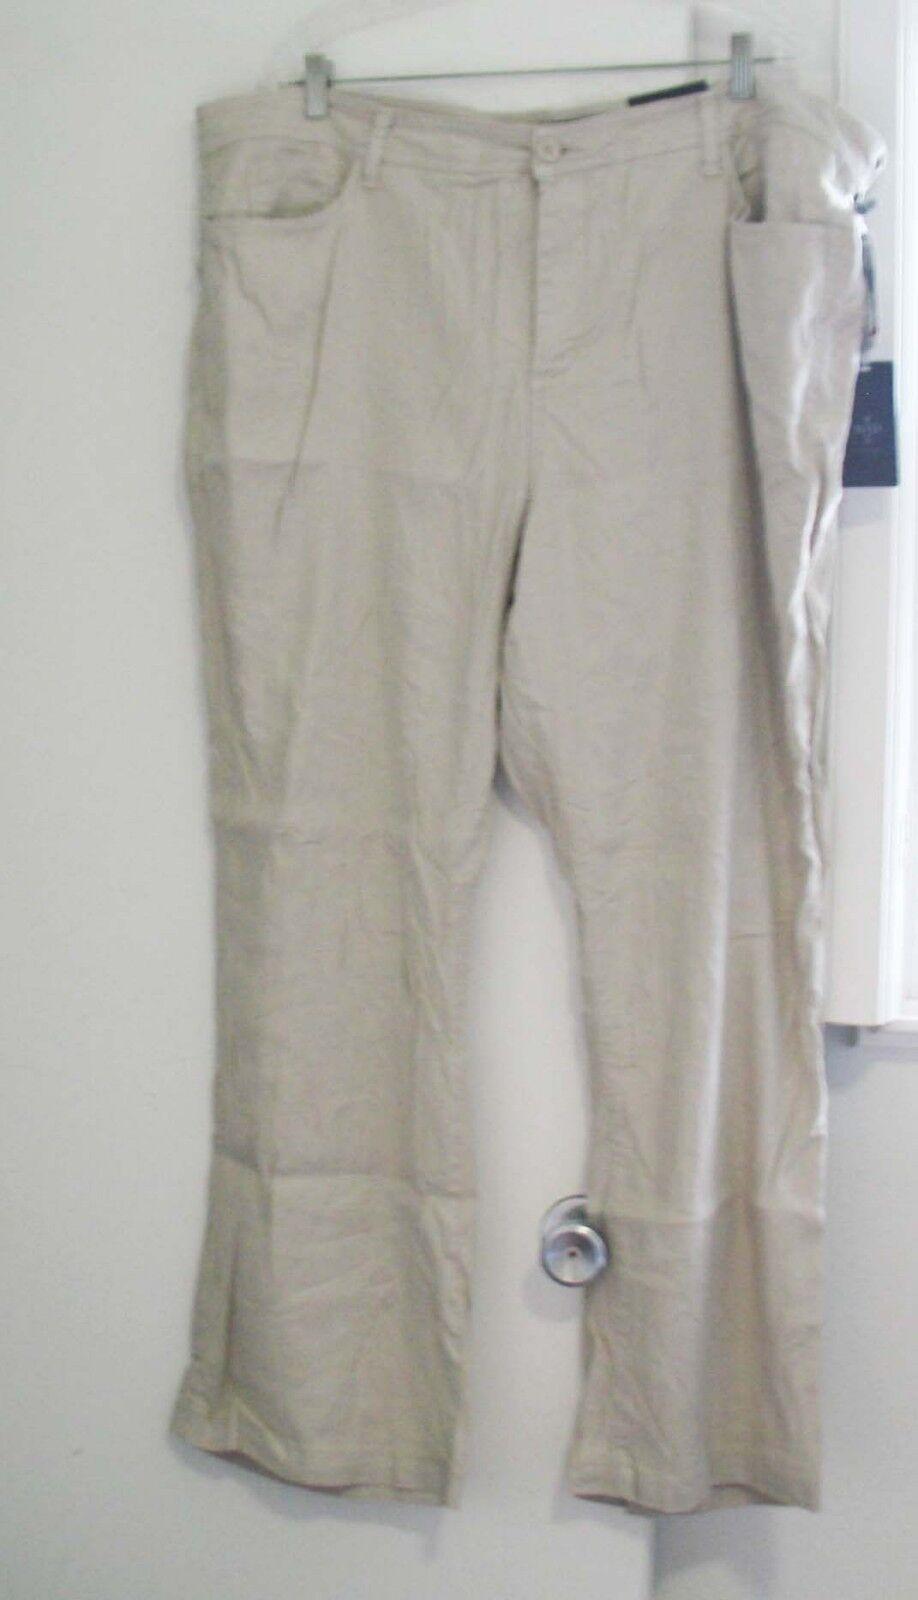 NYDJ Not Your Daughter's Jeans Plus Größe Wylie Linen Trousers Sand Dollar Sz 24W